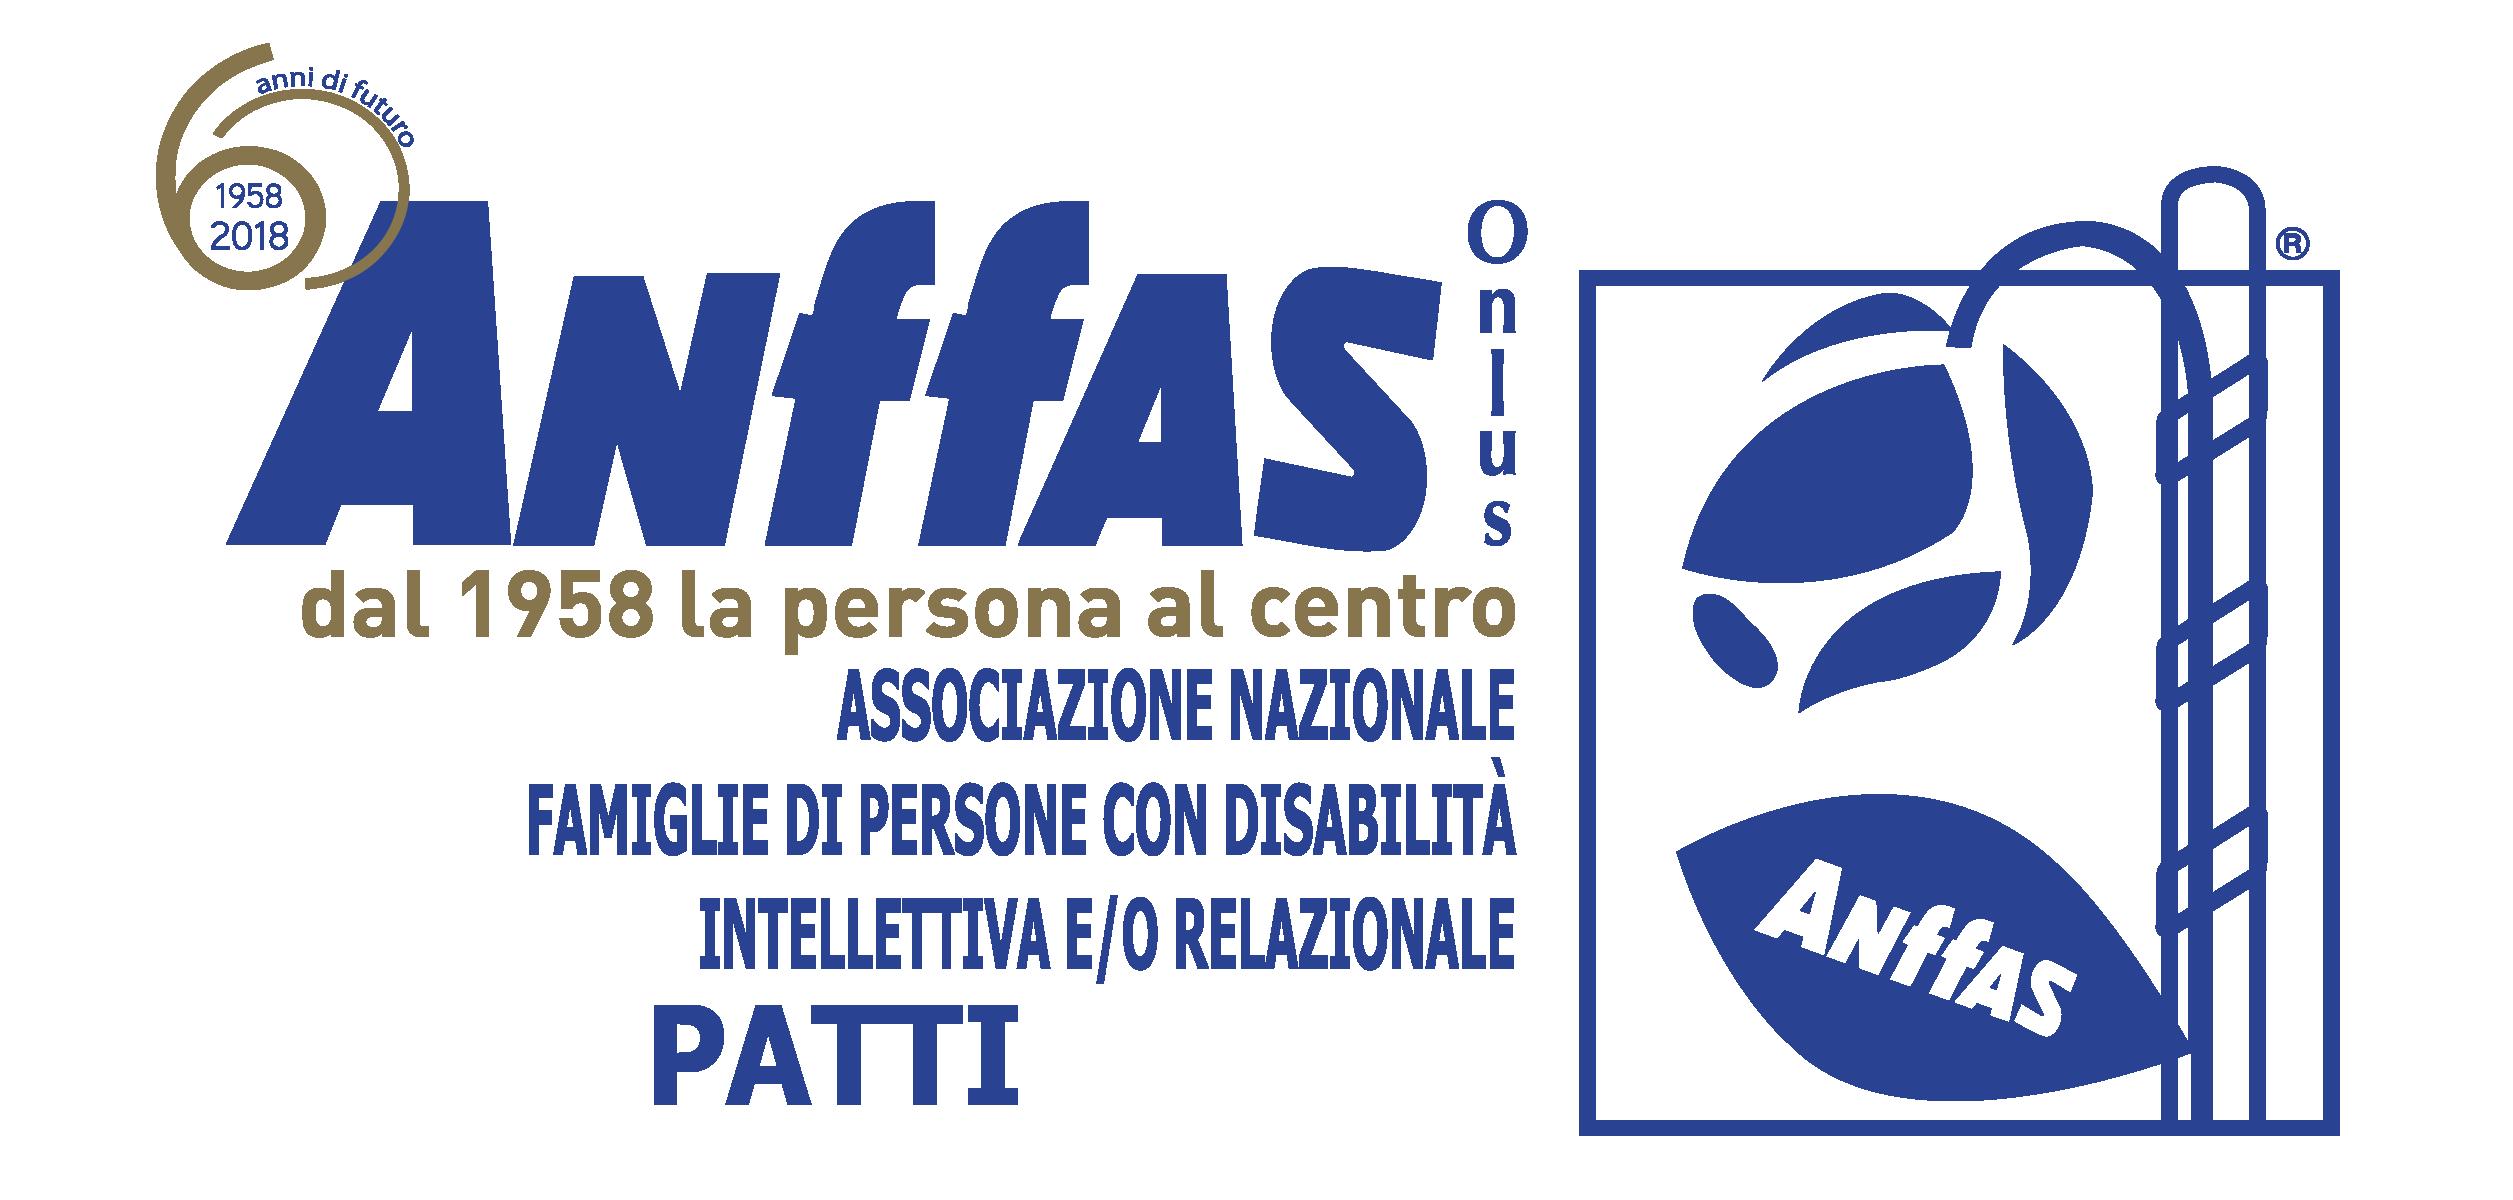 Logo Anffas Onlus Patti